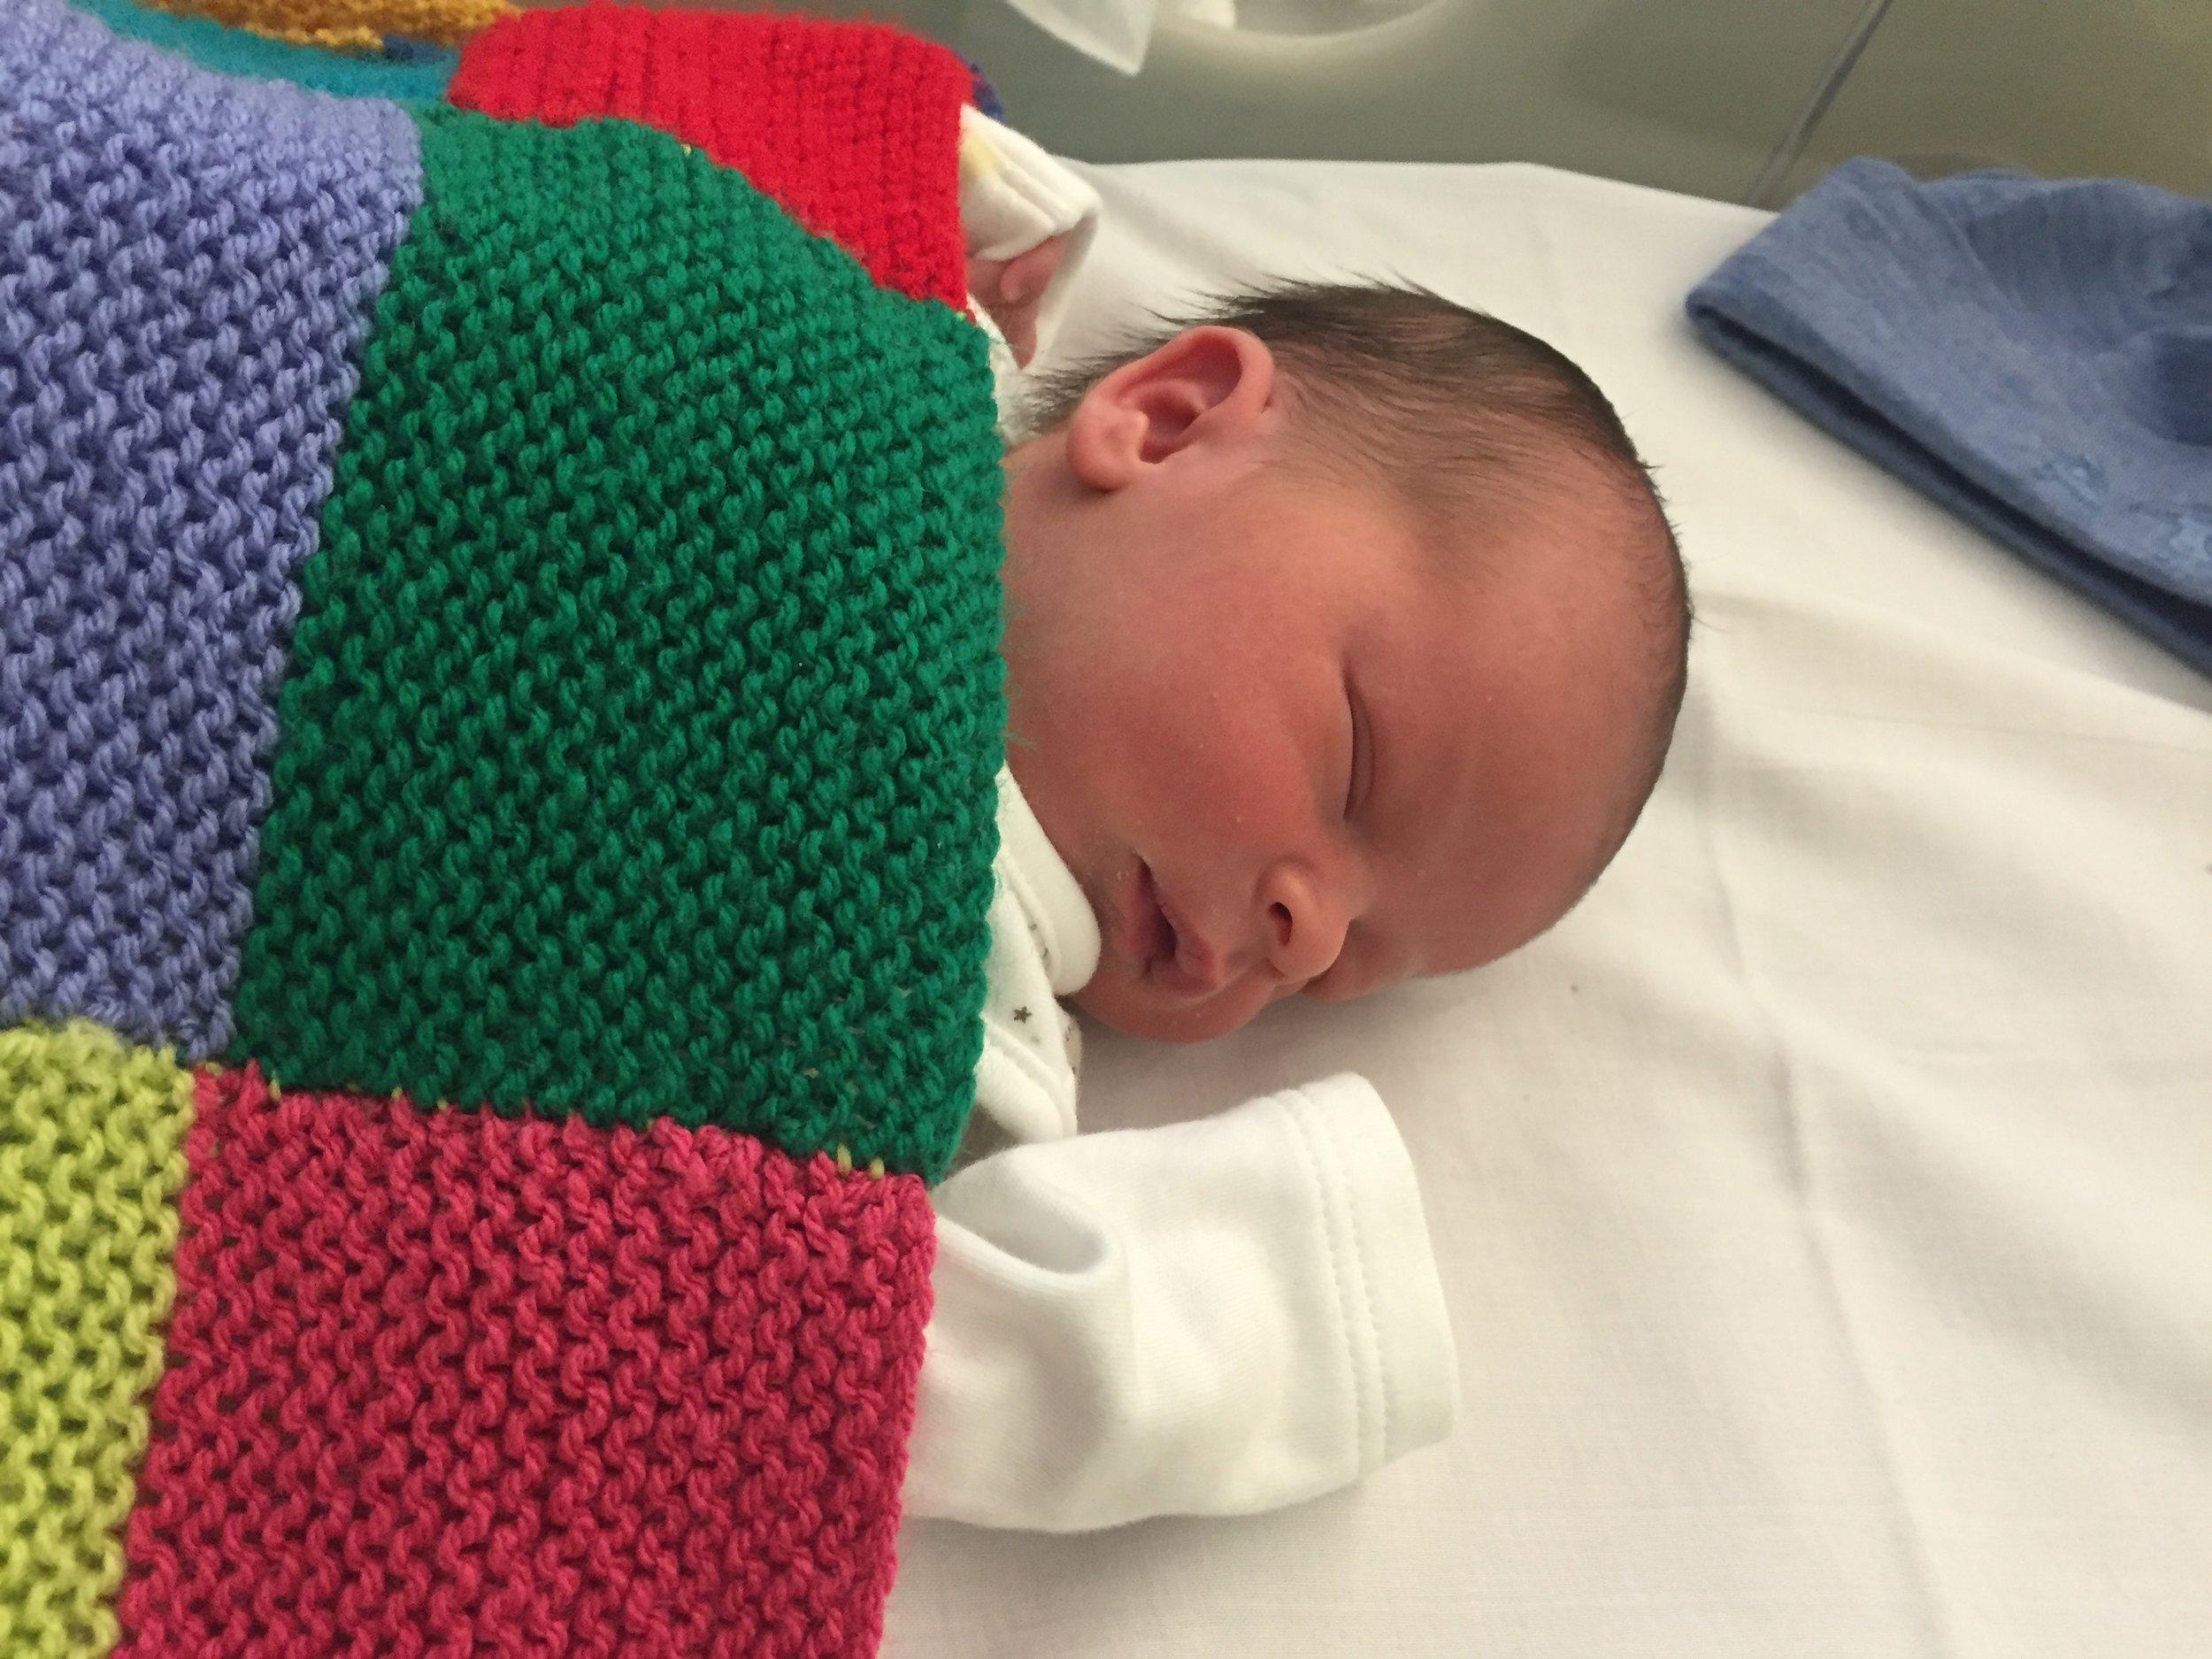 Warning: Do not be mislead by newborn sleeping baby photo